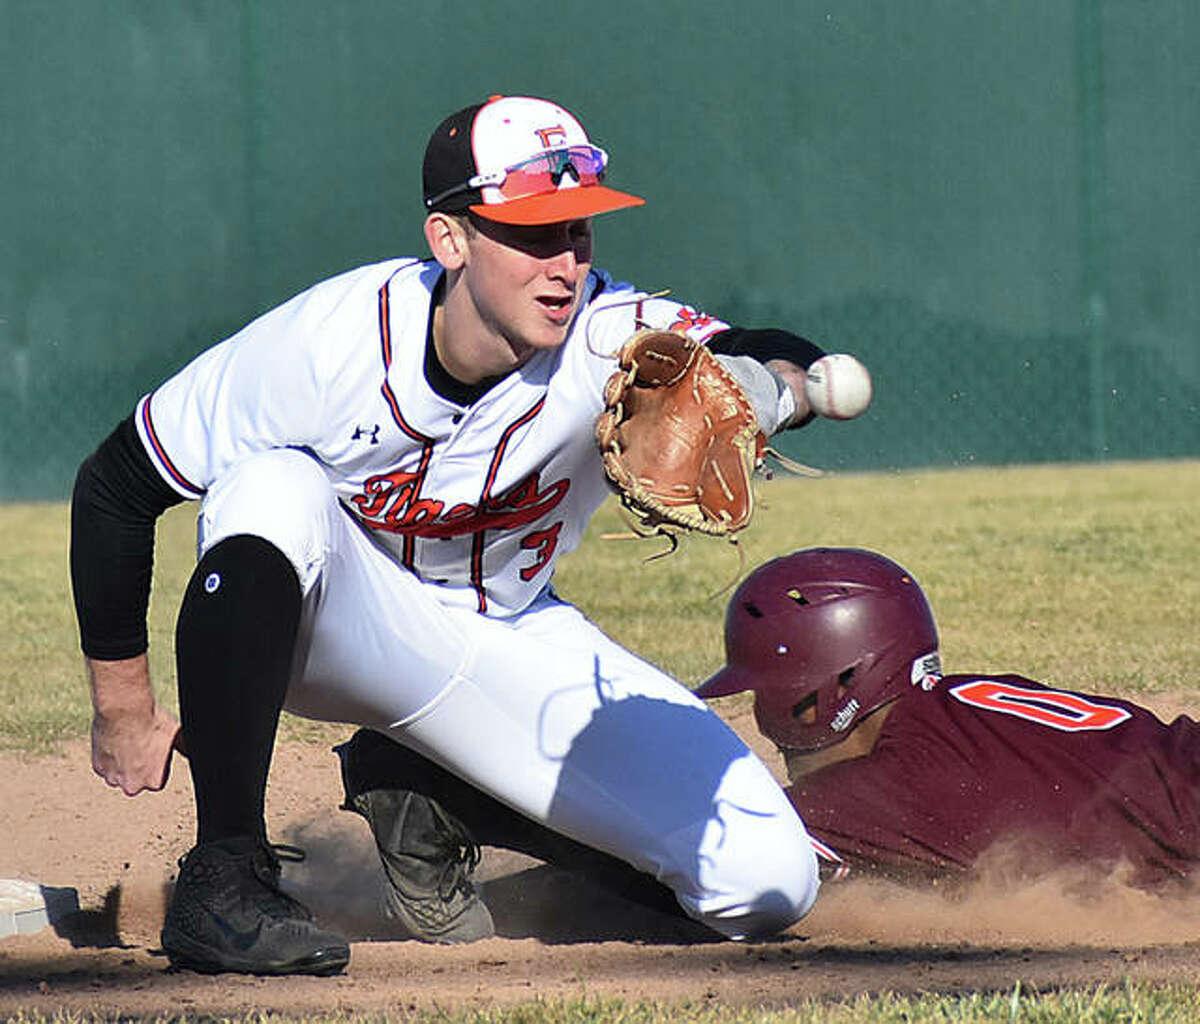 Former Edwardsville third baseman Jack Cooper will play baseball next season for Columbia University in New York.